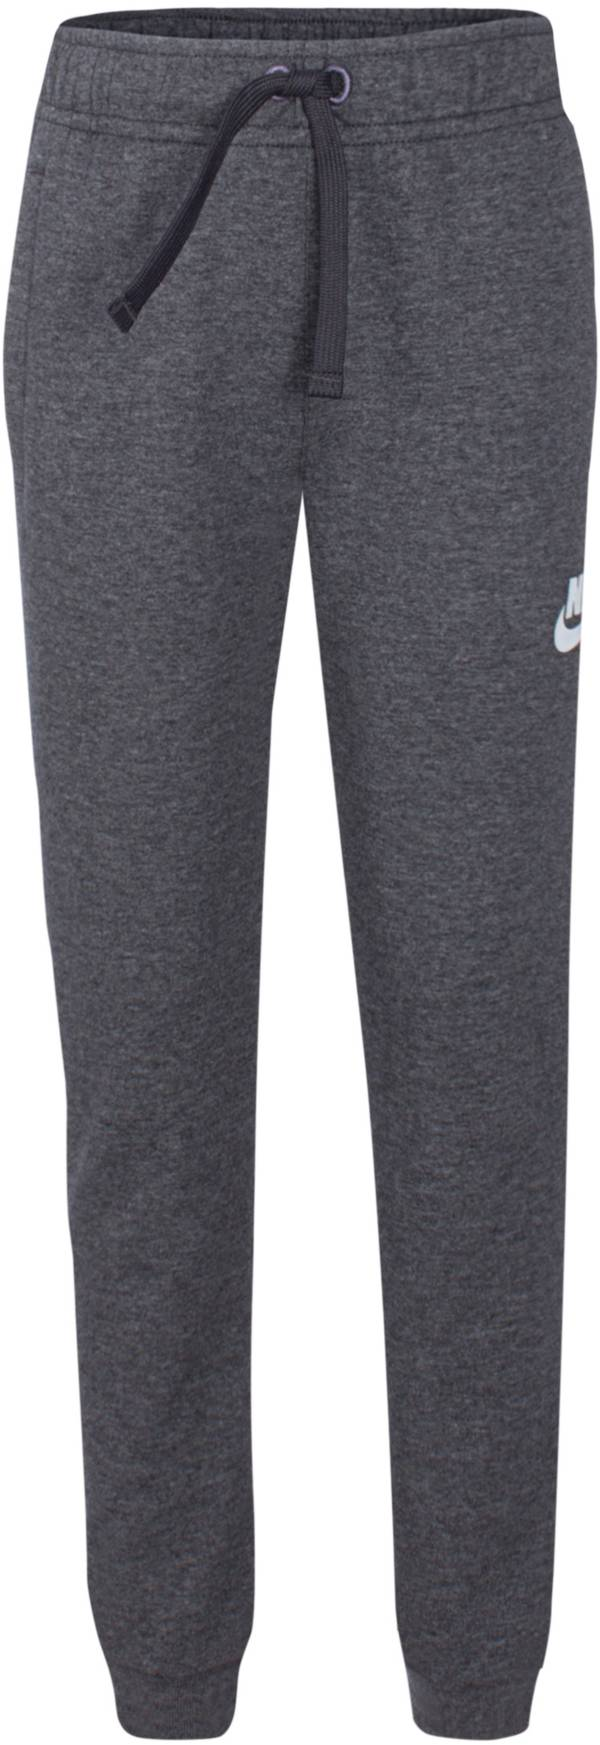 Nike Boys' AV15 Jogger Pants product image